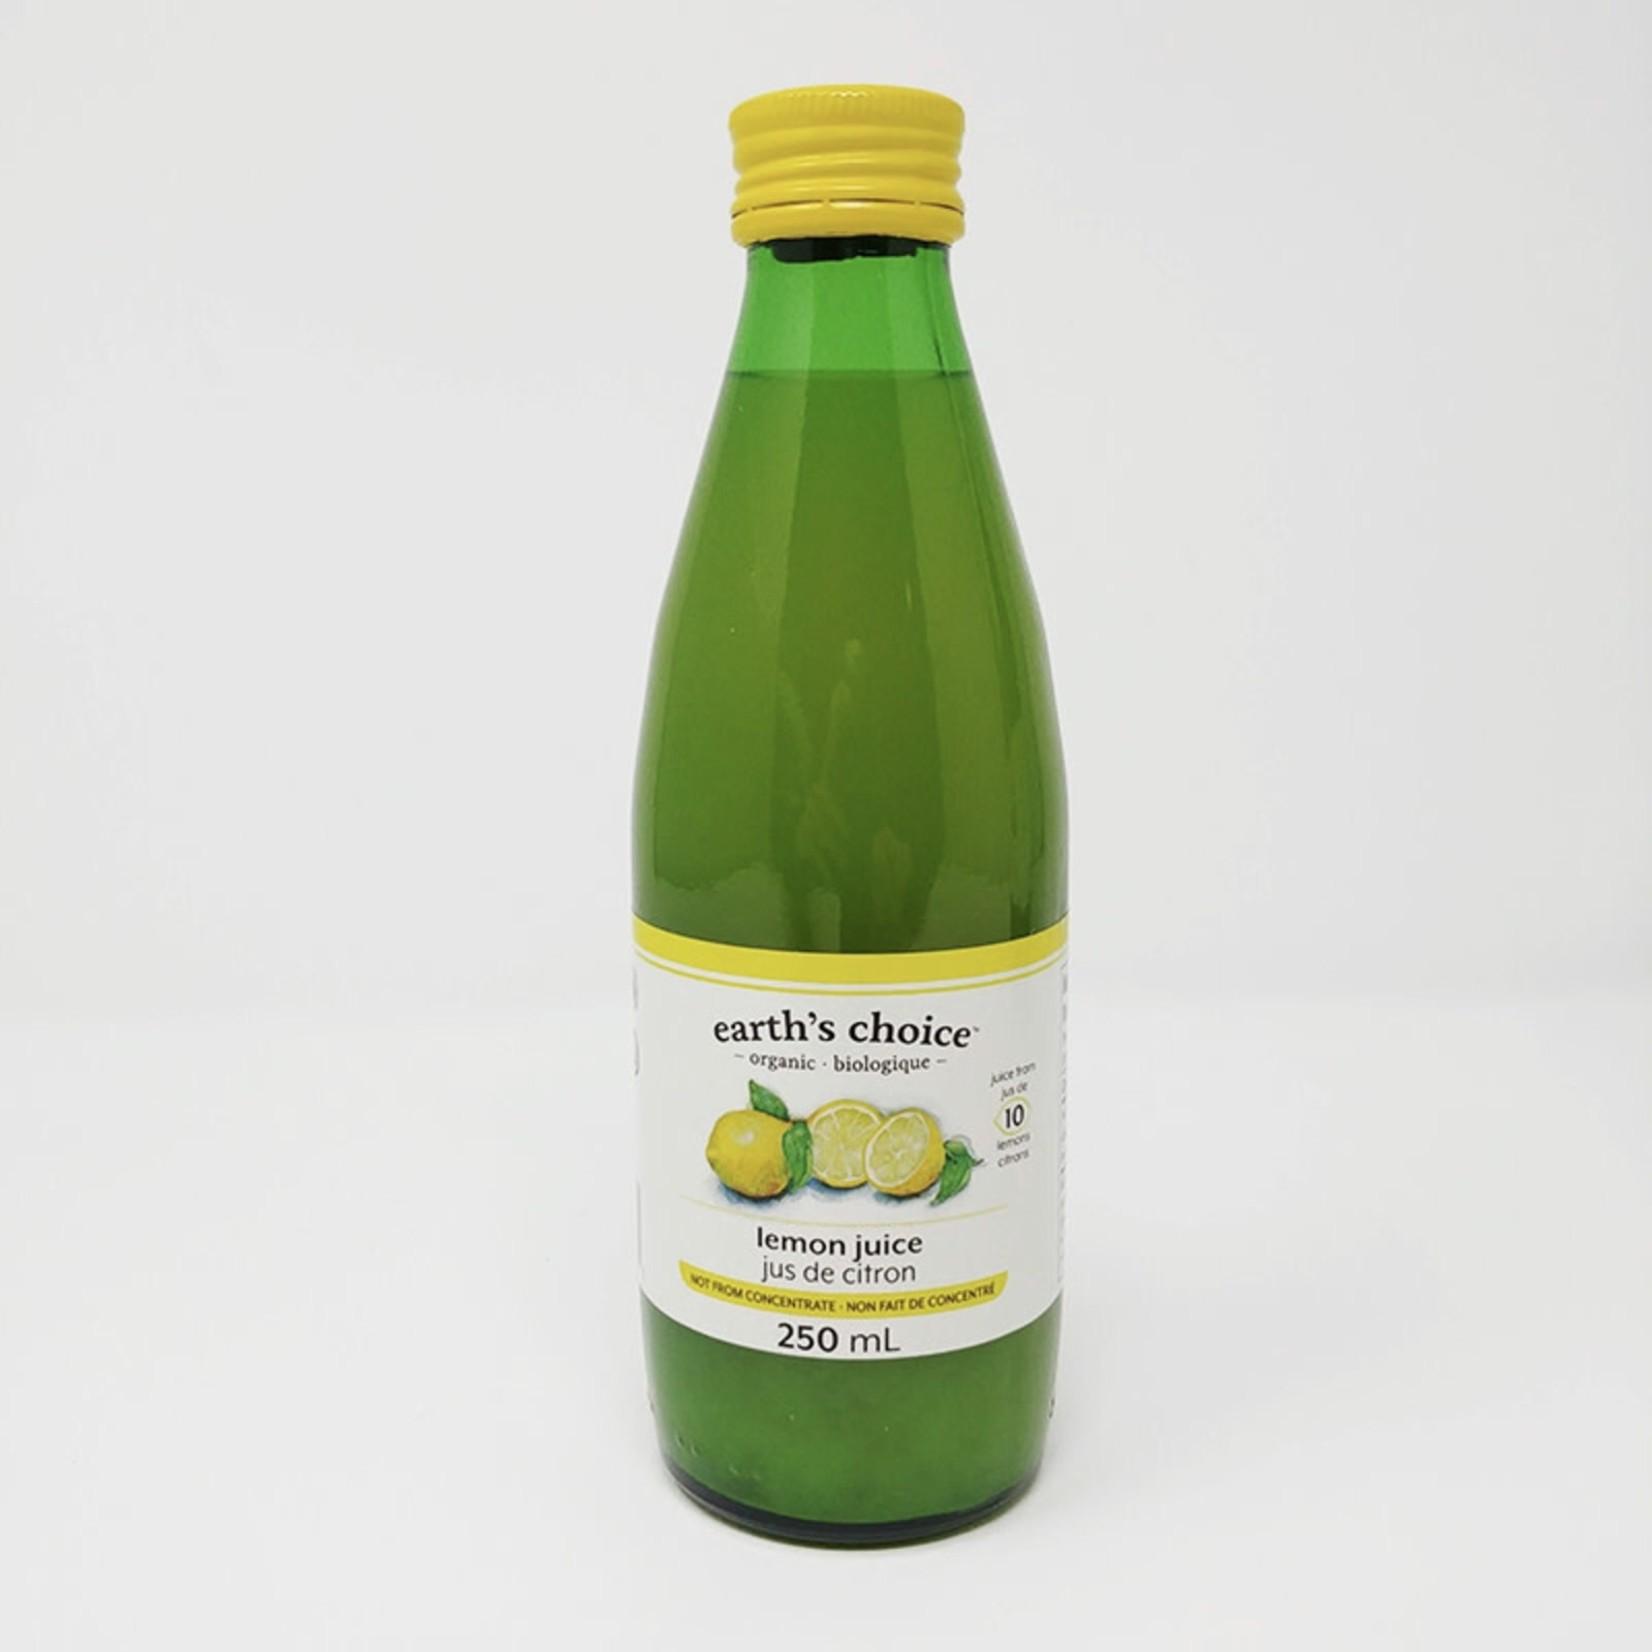 Earth's Choice Earth's Choice Organic Lemon Juice 250ml